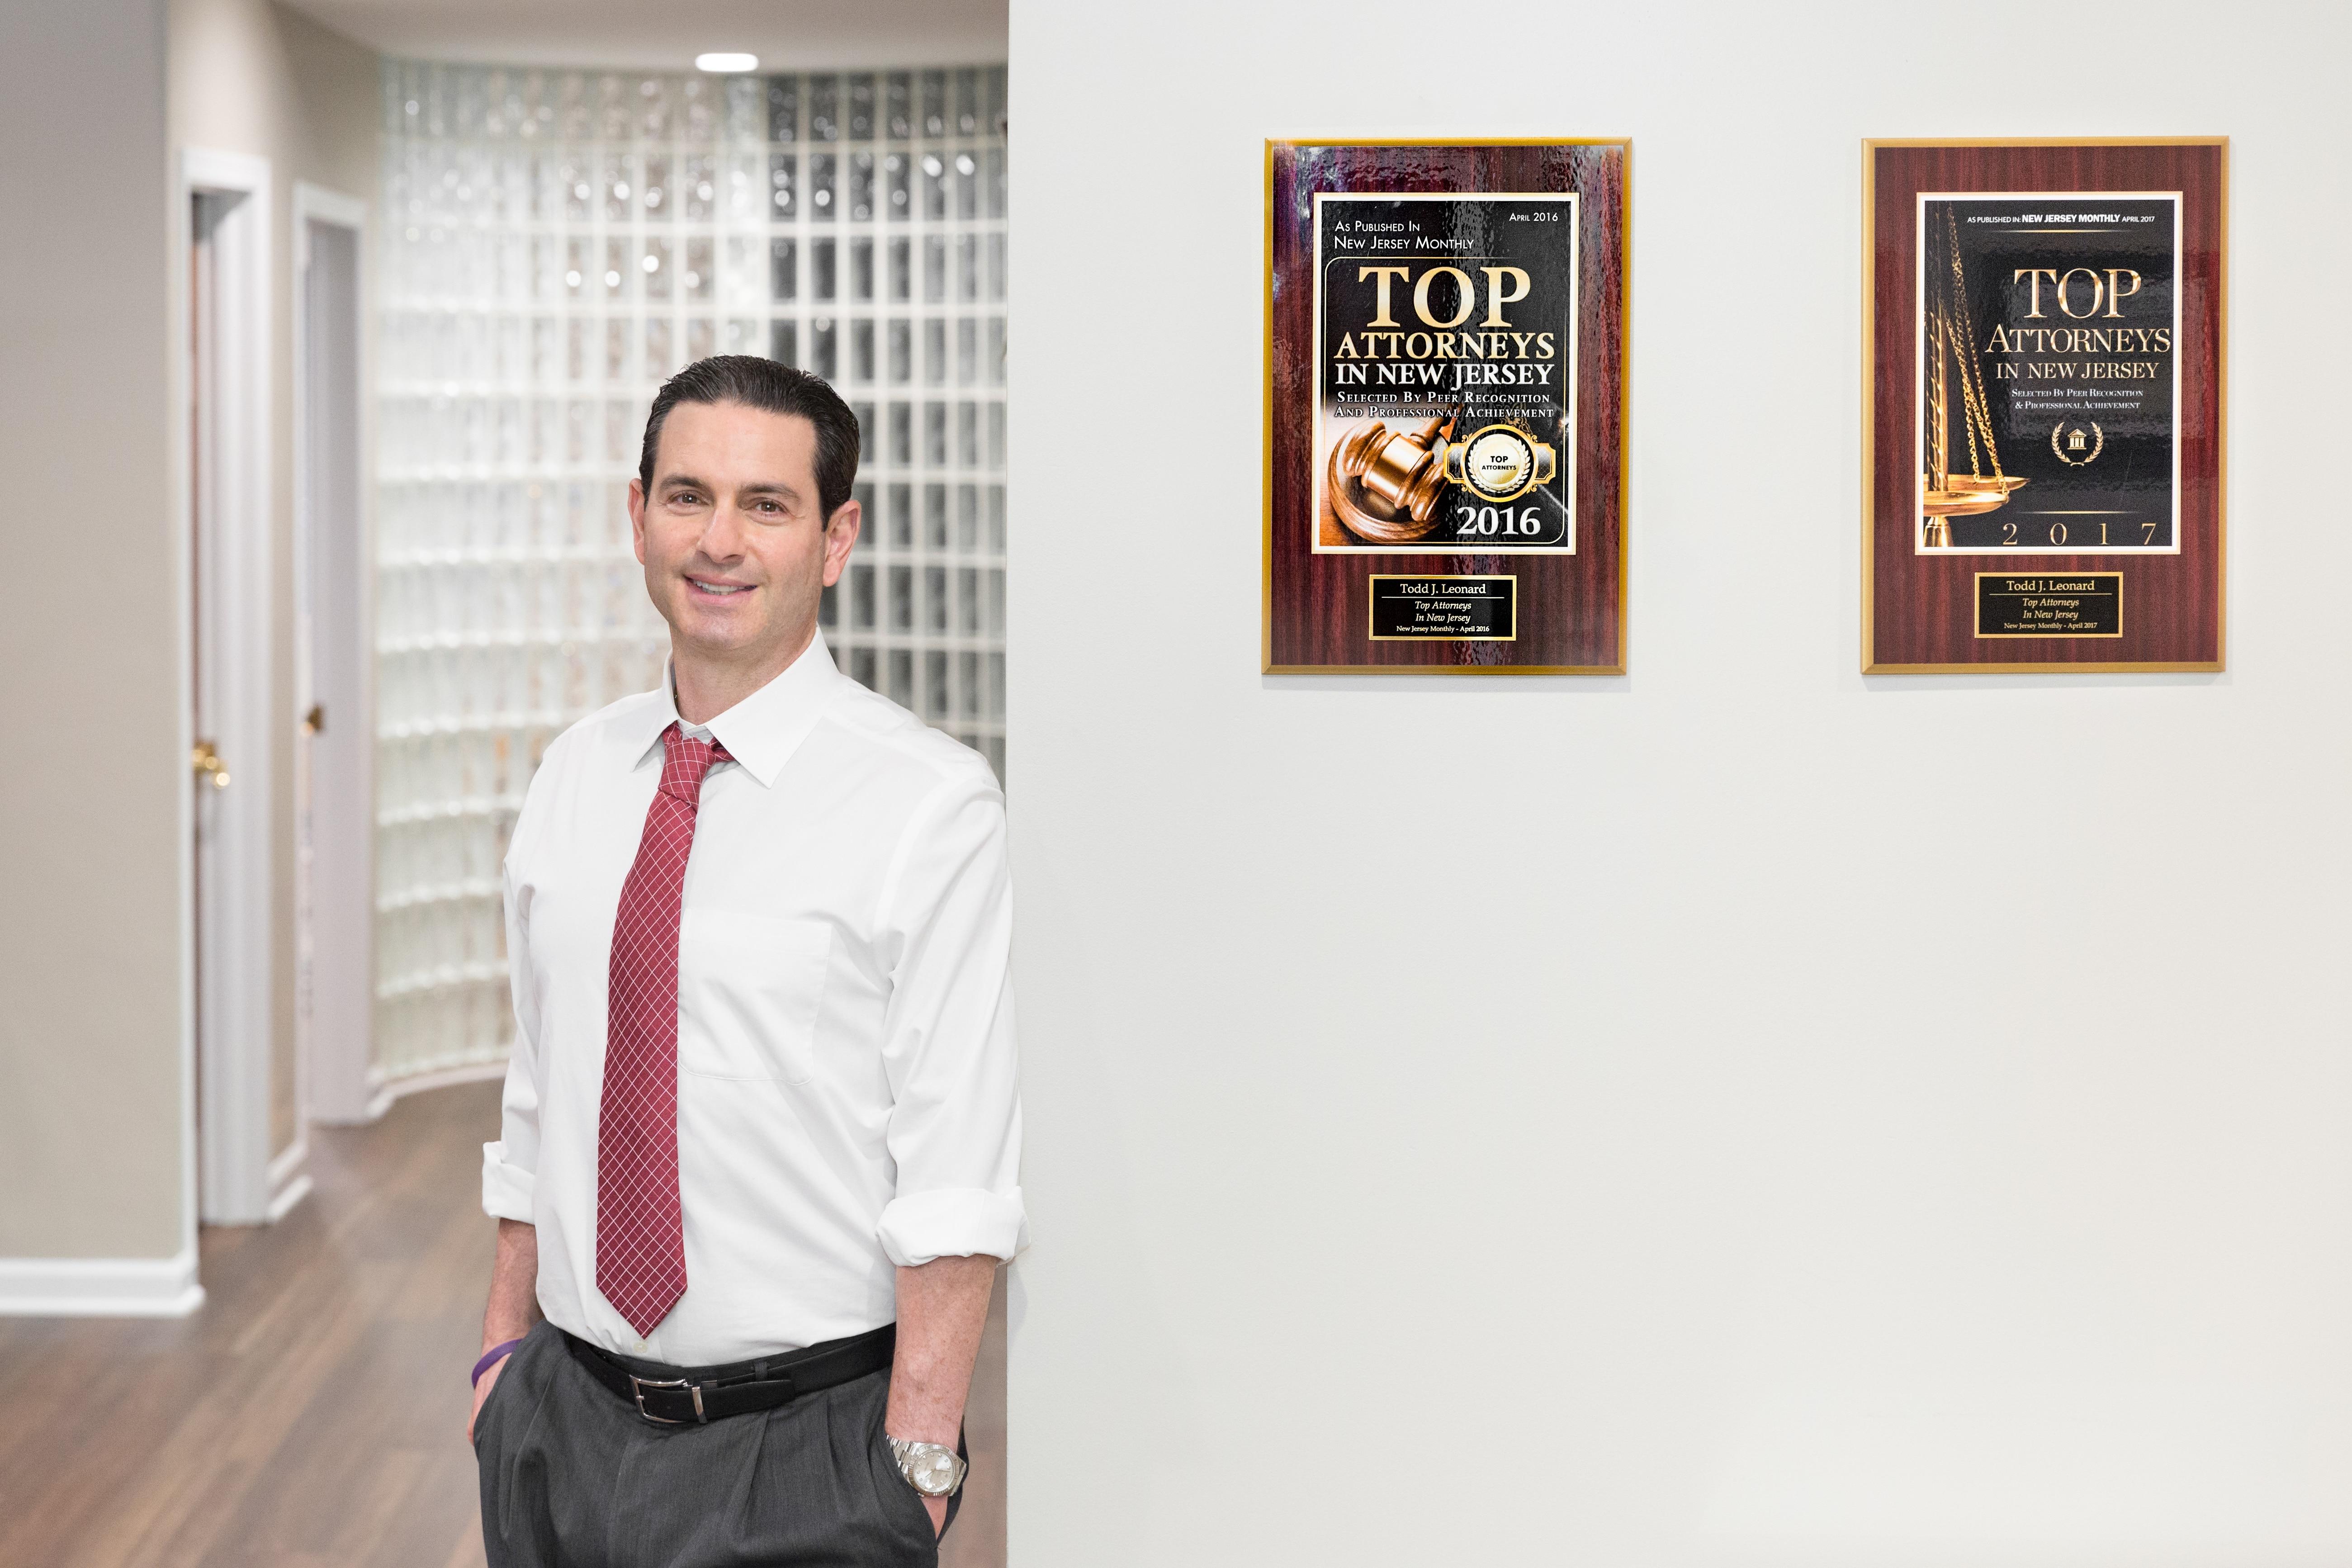 Todd Leonard Law Firm photo gallery 4